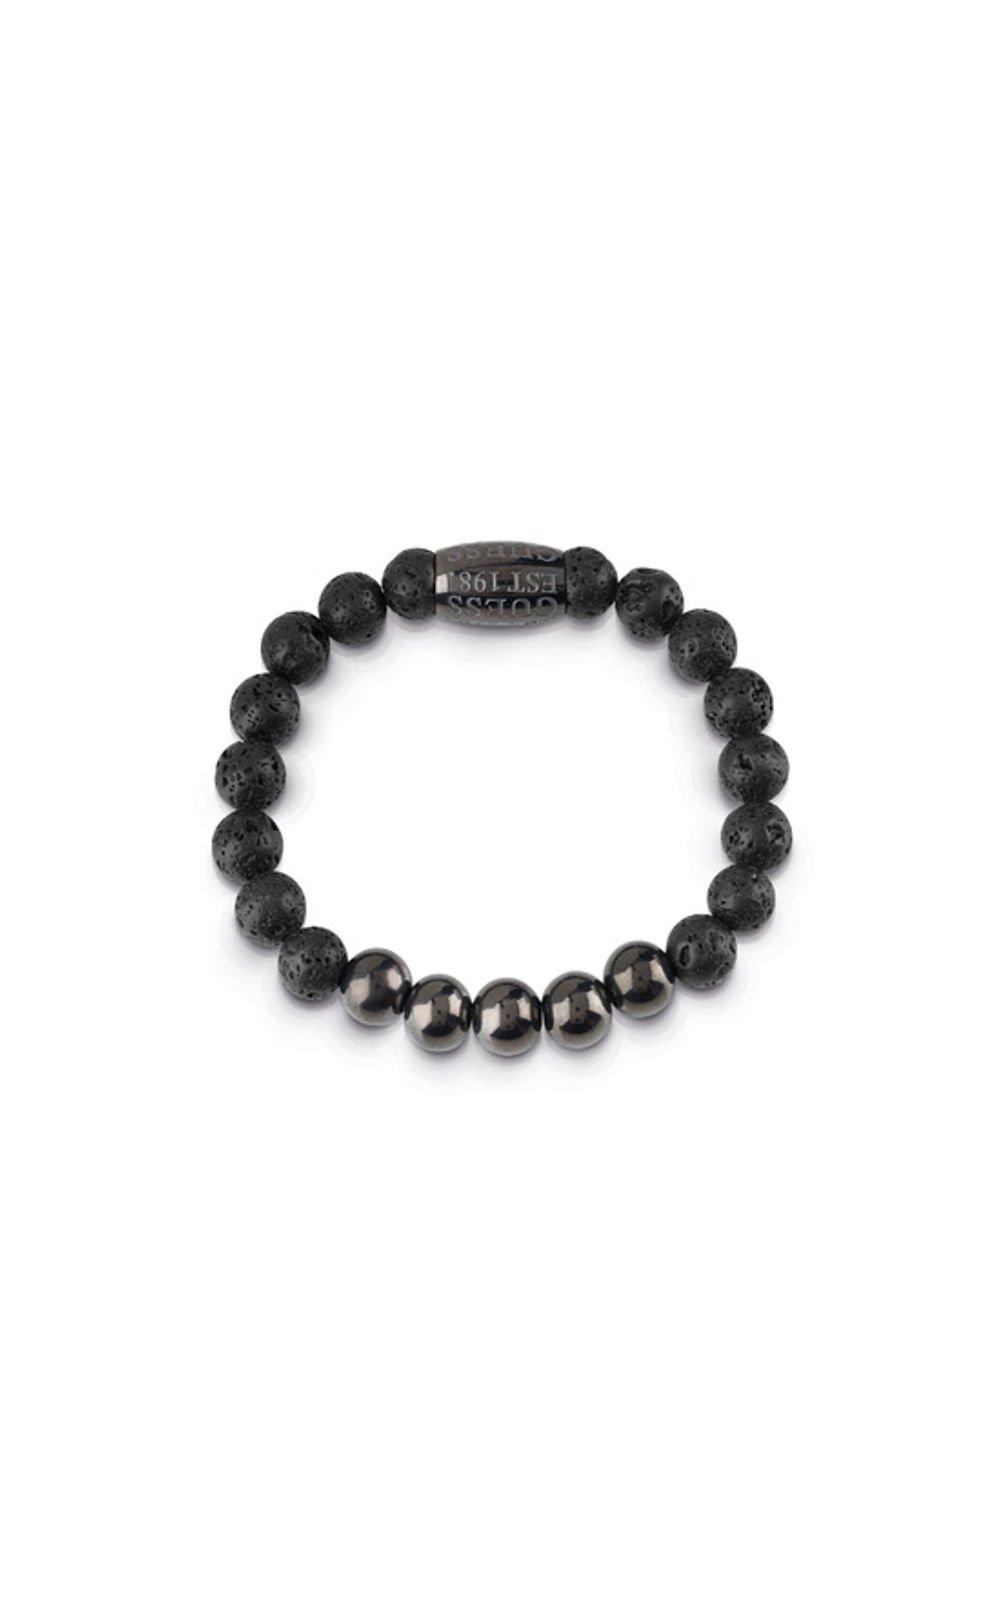 GUESS MEN UMB85017 Βραχιόλι Μαύρο Με Χάντρες